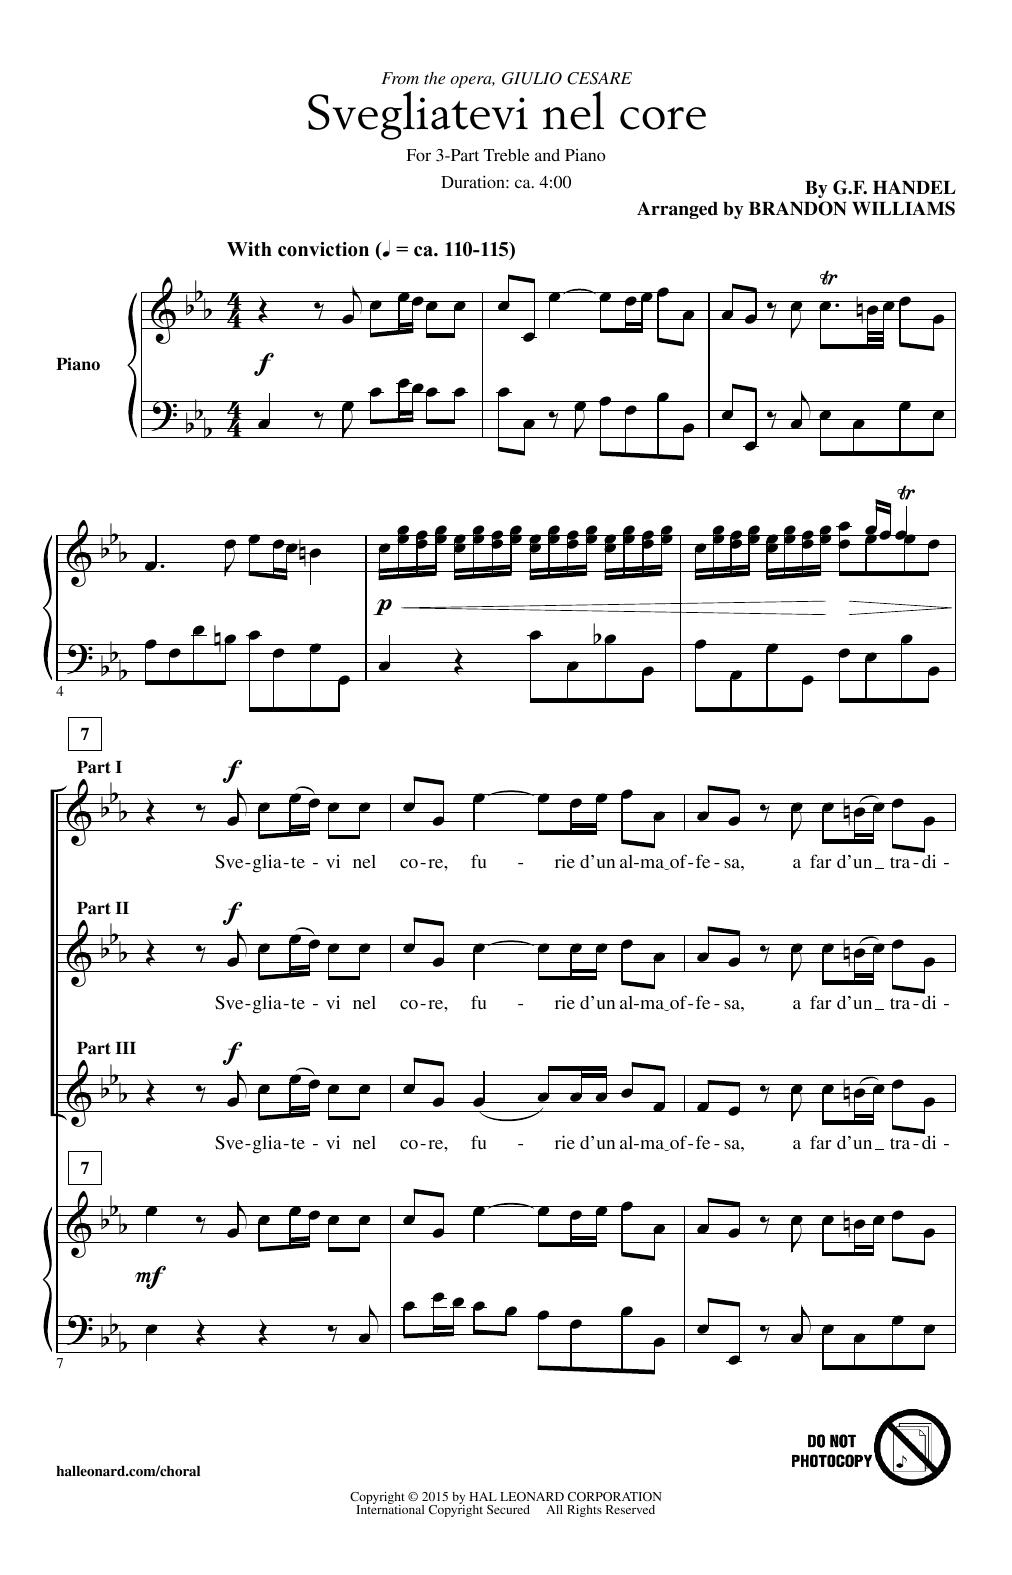 Brandon Williams Svegliatevi Nel Core sheet music notes and chords. Download Printable PDF.